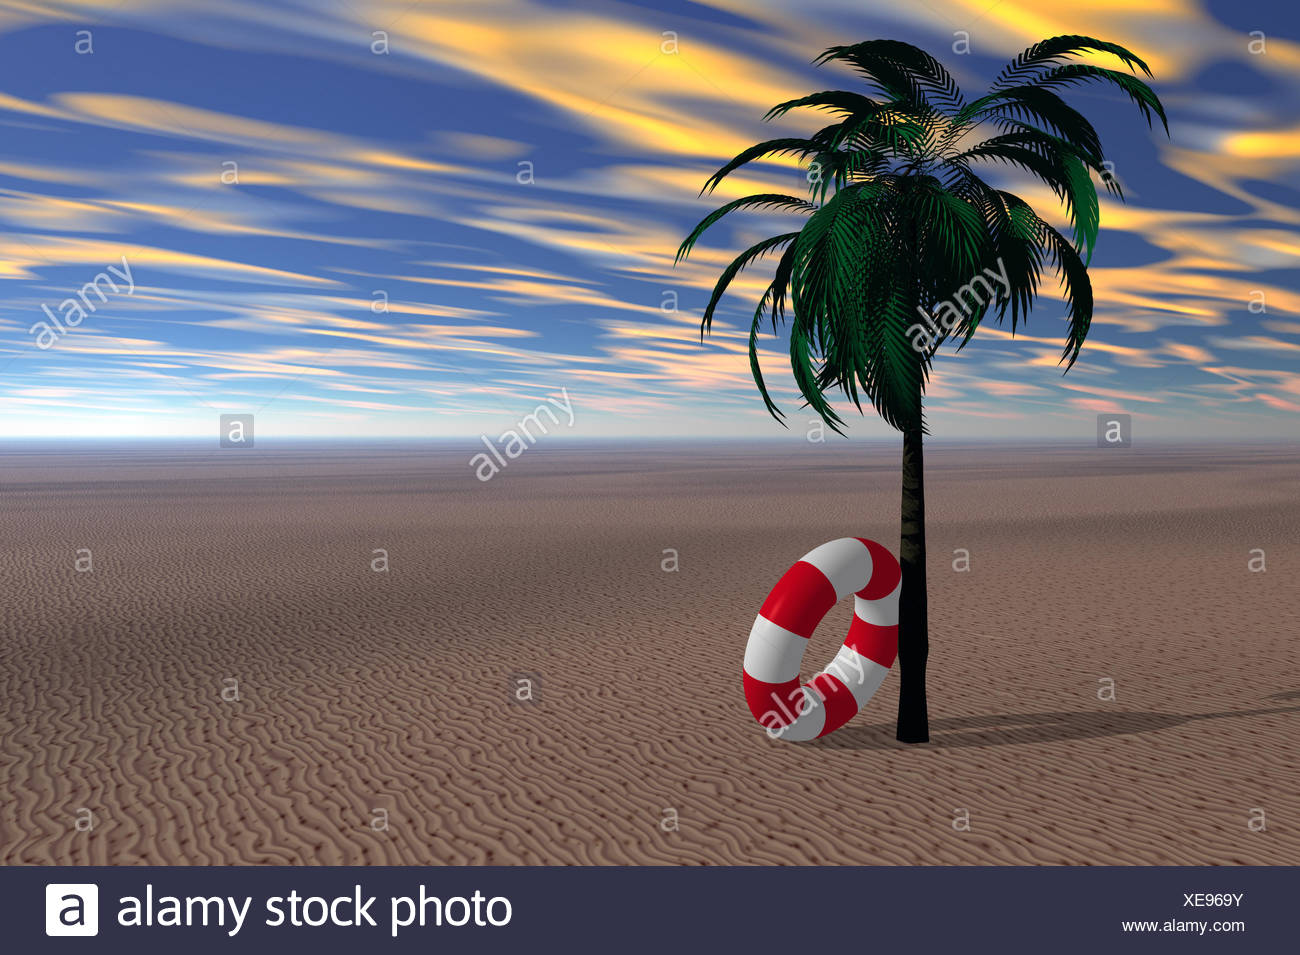 palm tree sandy beach low tide striae bathing ring sands sand blue ...